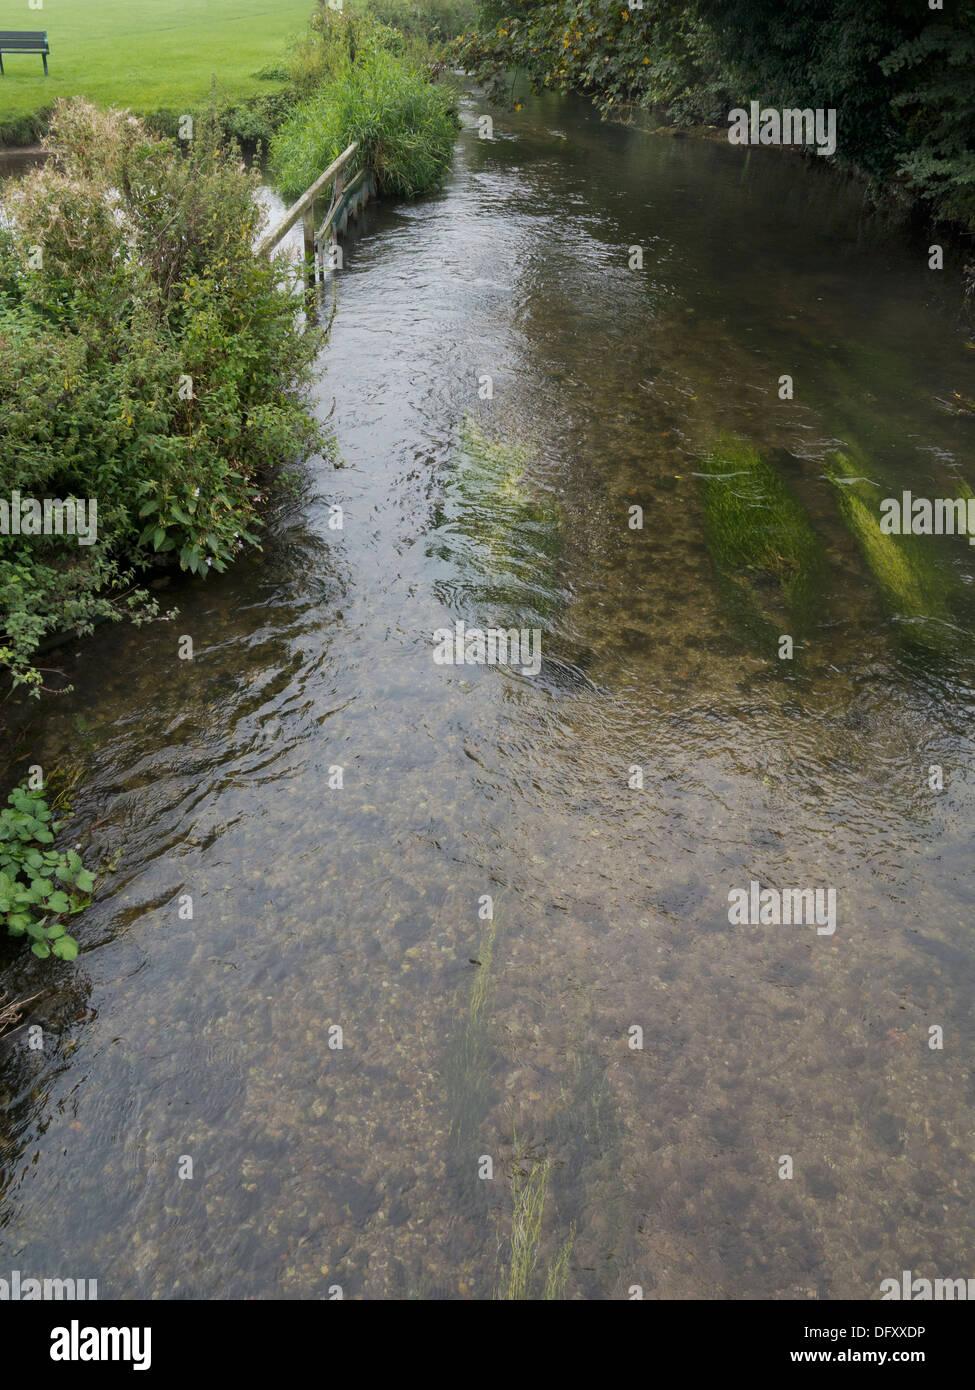 River Wye a Chilterns chalkstream, Bourne End, Bucks UK - Stock Image